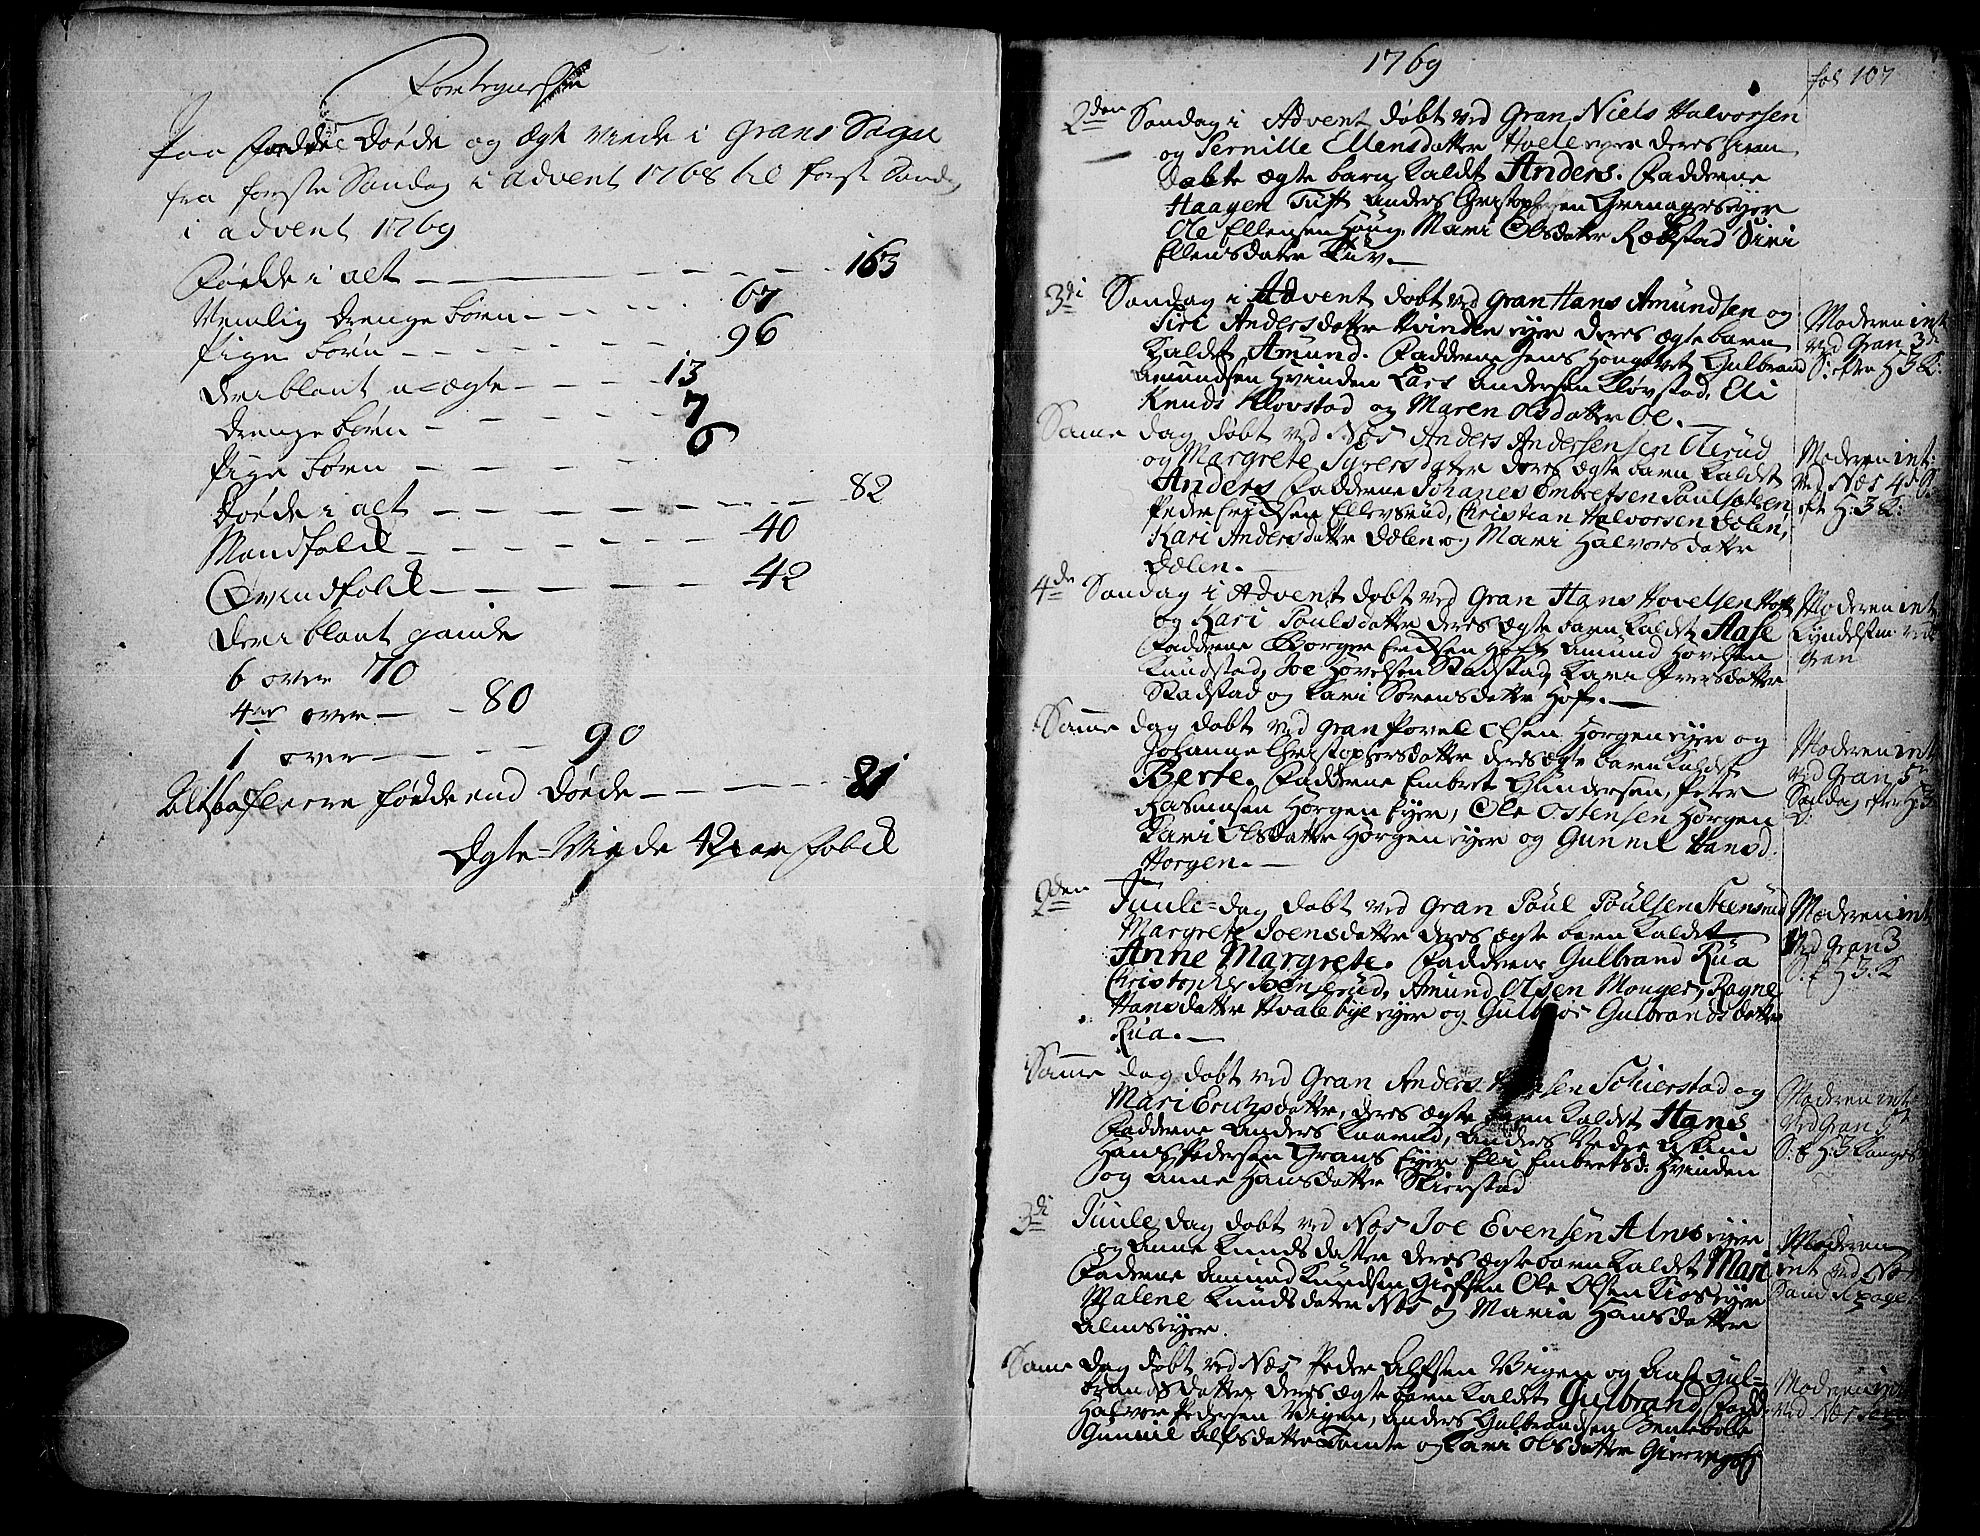 SAH, Gran prestekontor, Ministerialbok nr. 4, 1759-1775, s. 107